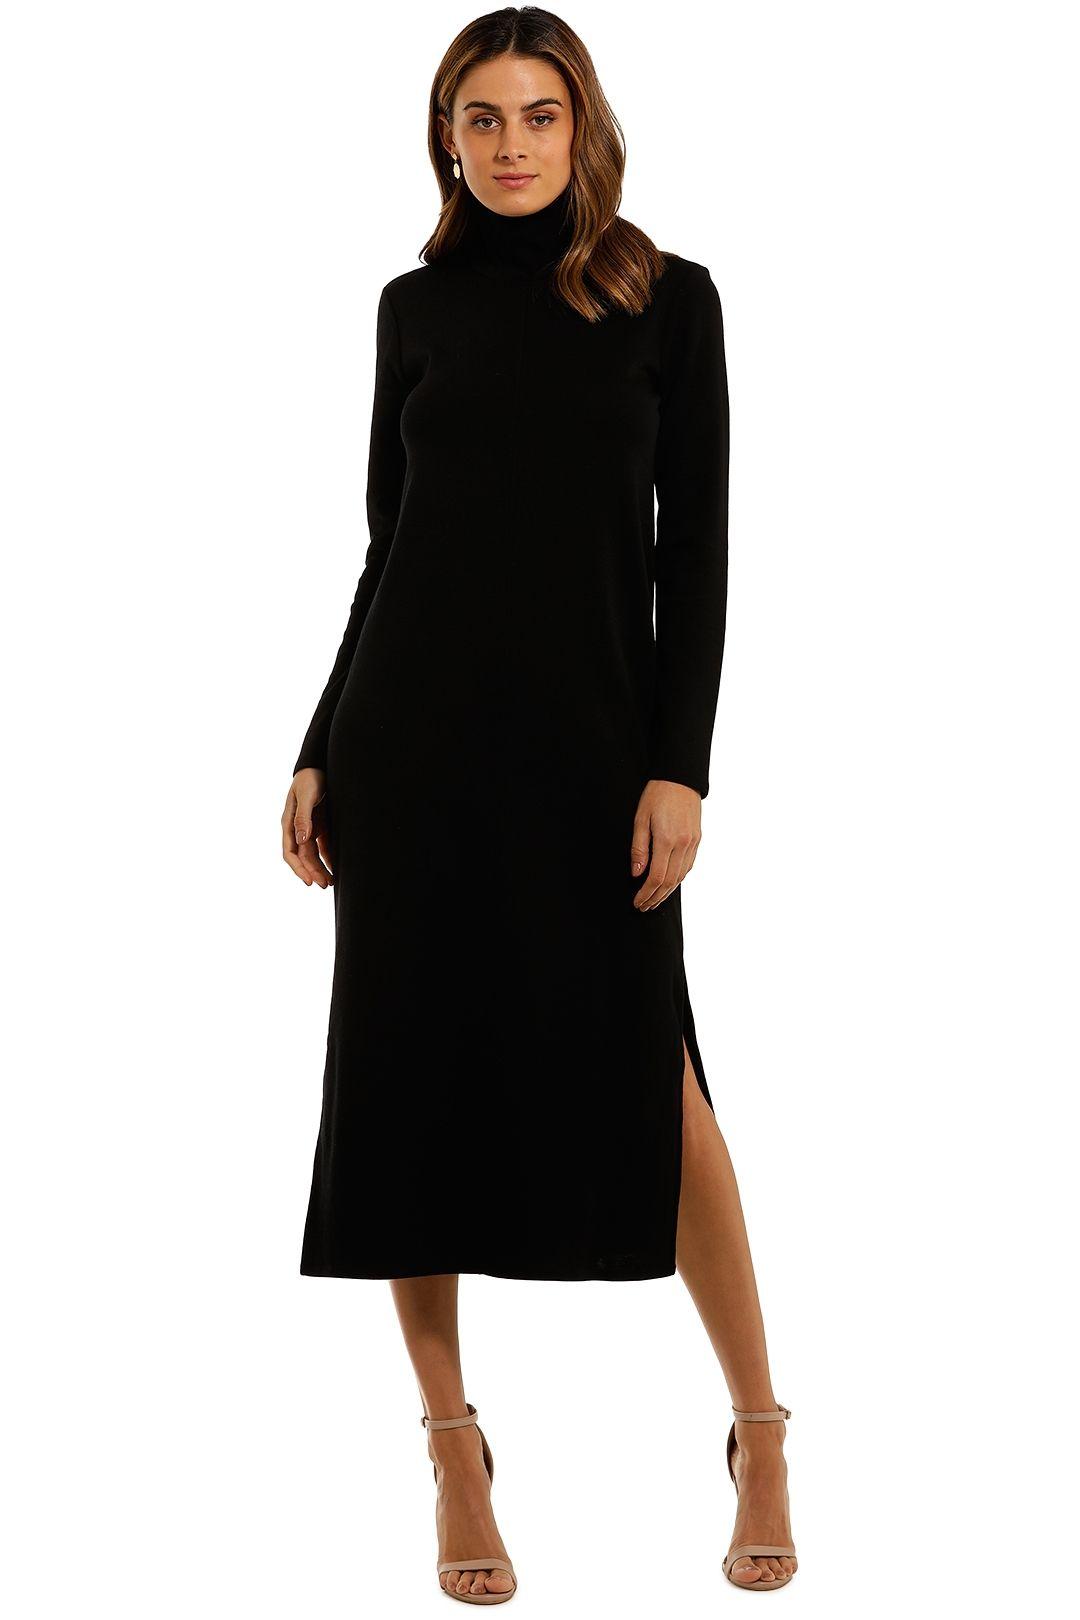 Witchery Seam Jersey Dress high neck